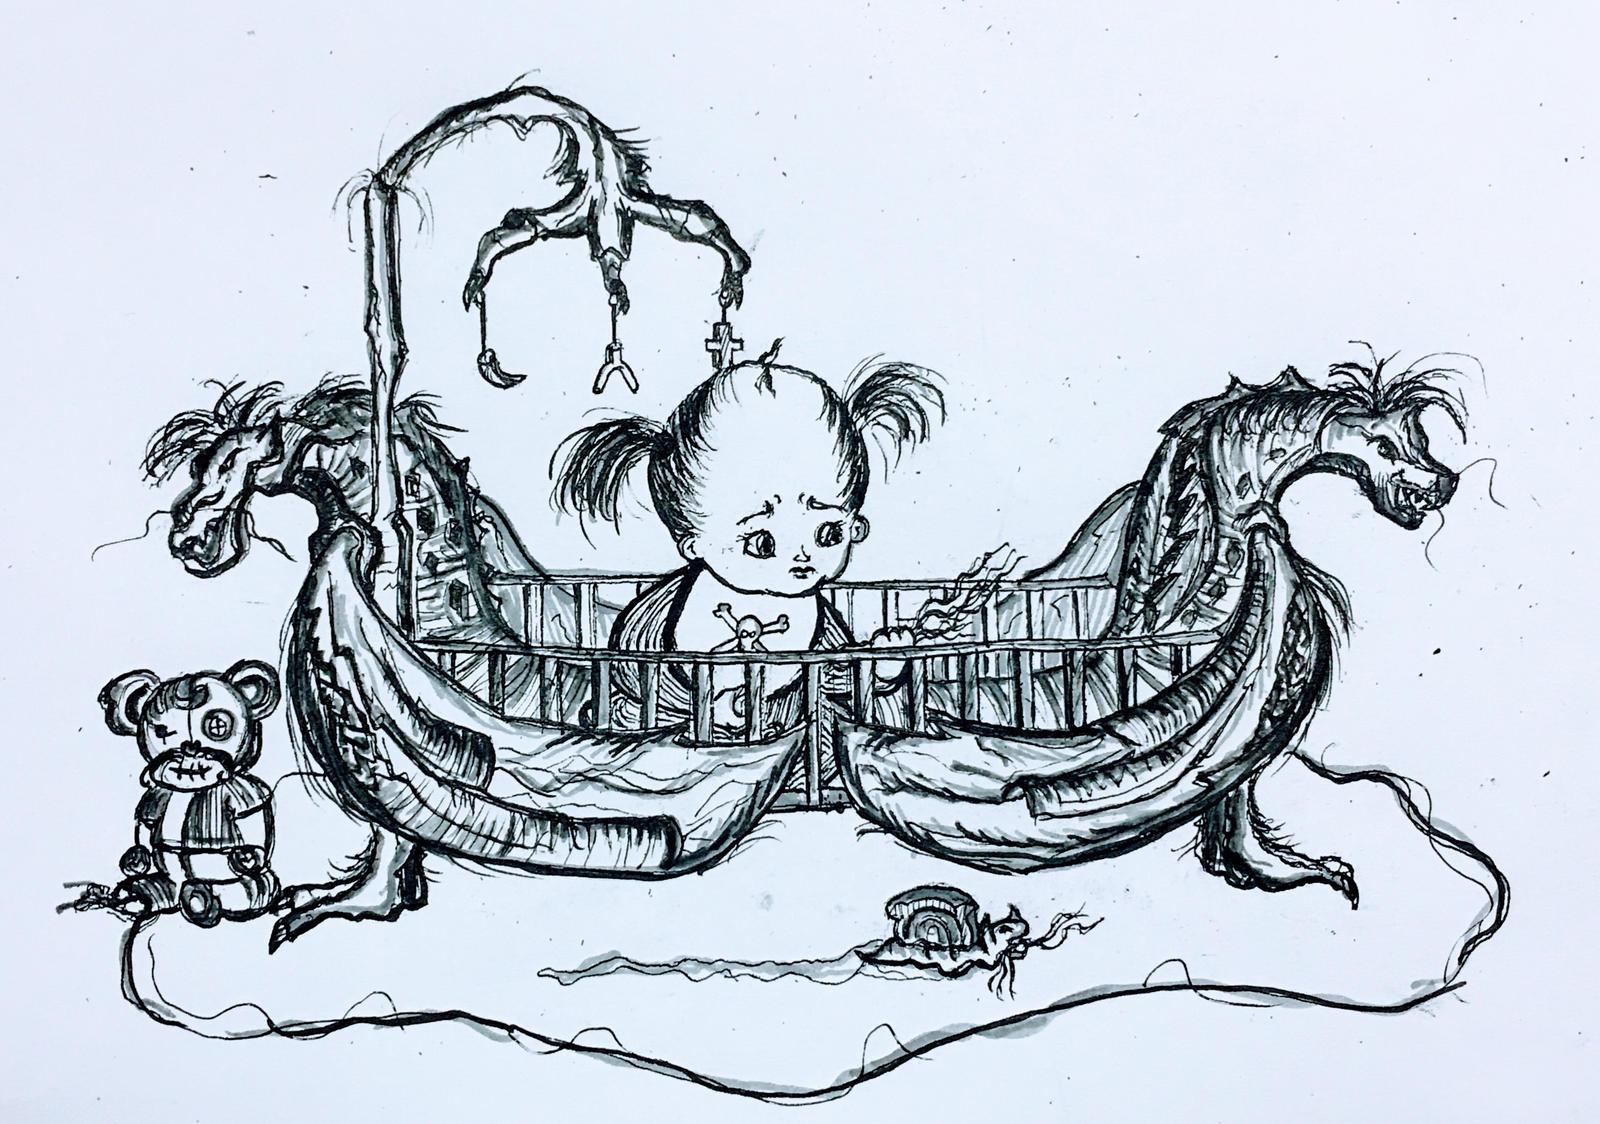 Monster On a Stick Scene 1